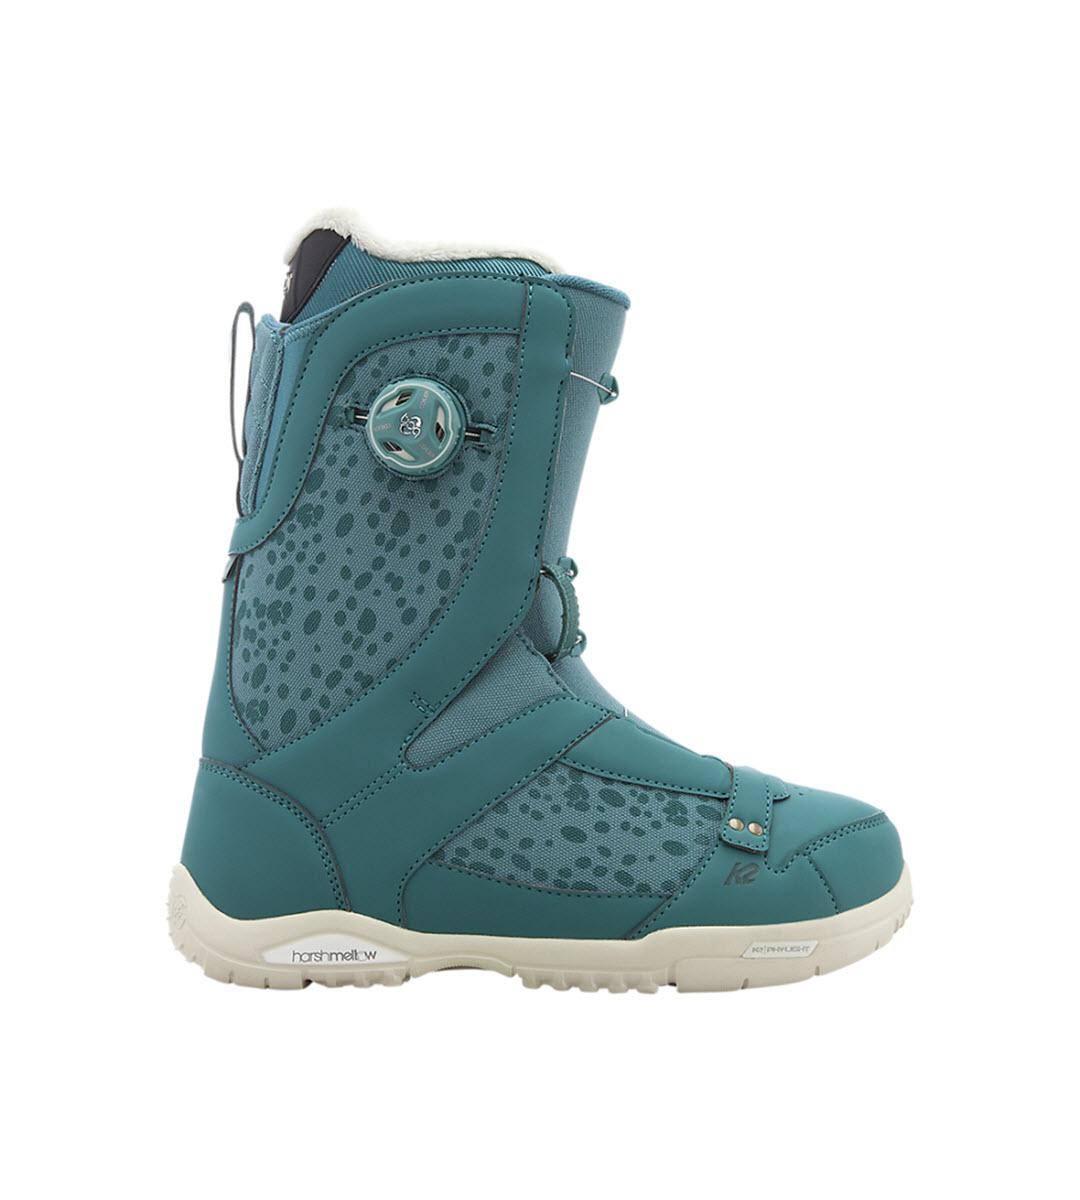 K2 Sapera Womens Snowboard Boots 2017 Rainforest UK 8